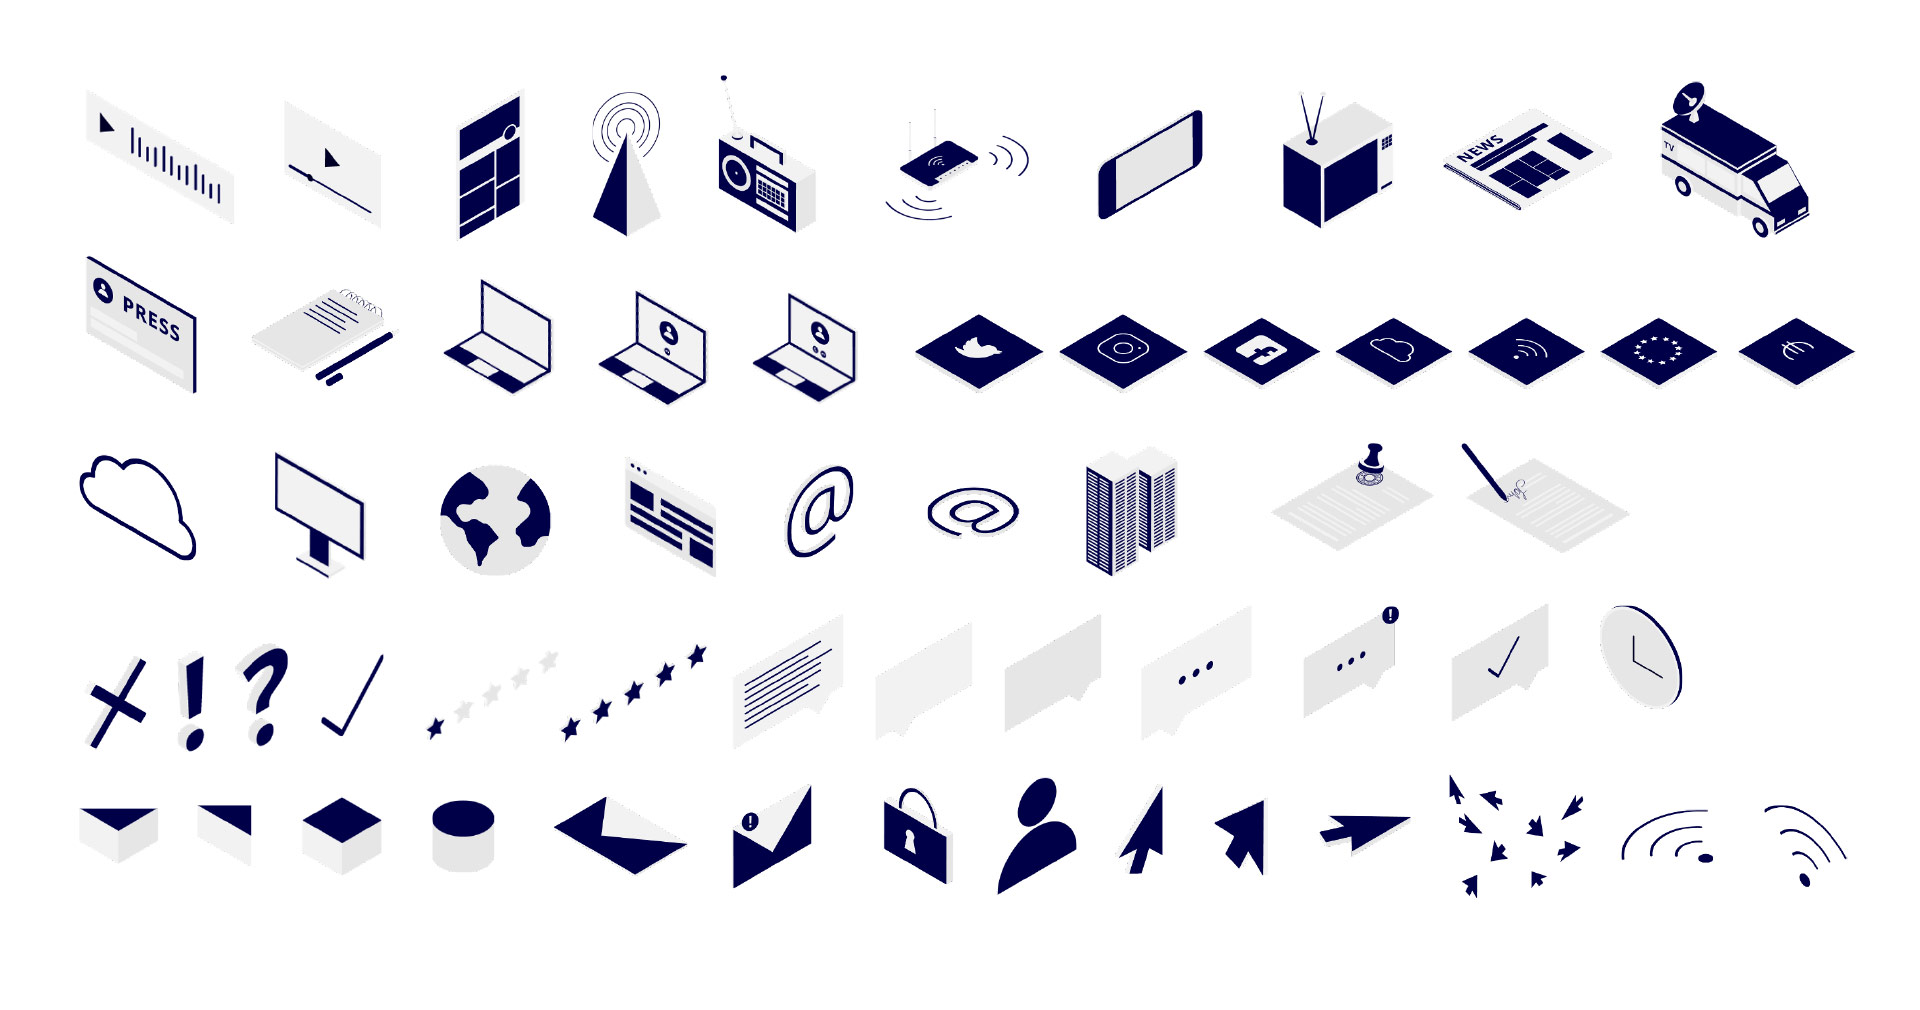 Übersicht verschiedener Grafiken in isometrischer Perspektive